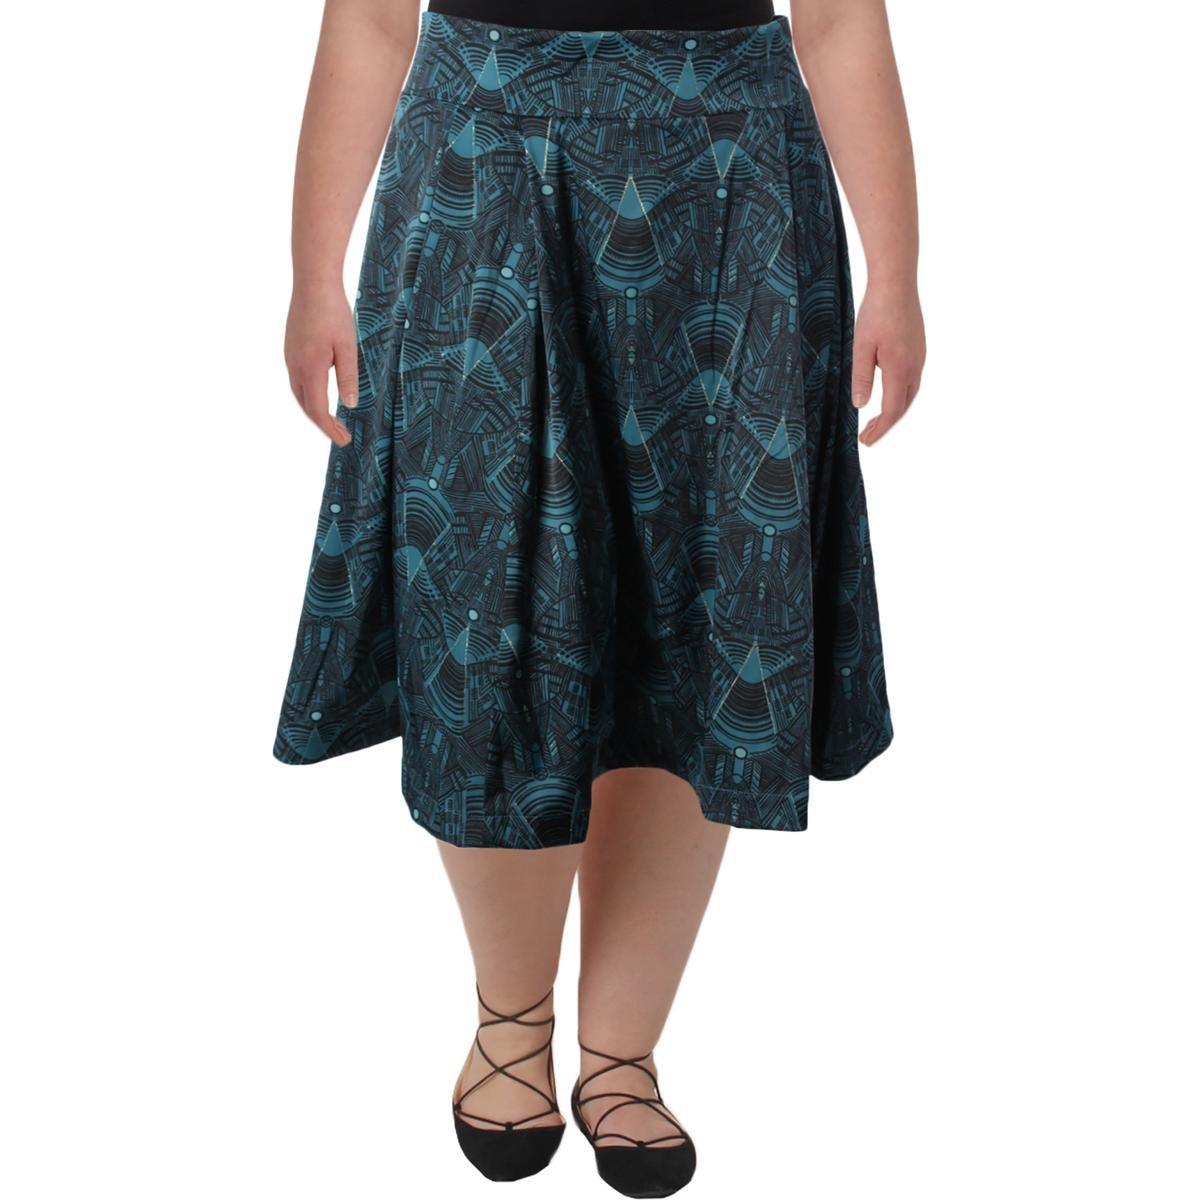 Melissa McCarthy Seven7 Womens Plus Printed Metallic A-Line Skirt Green 3X by Melissa McCarthy Seven7